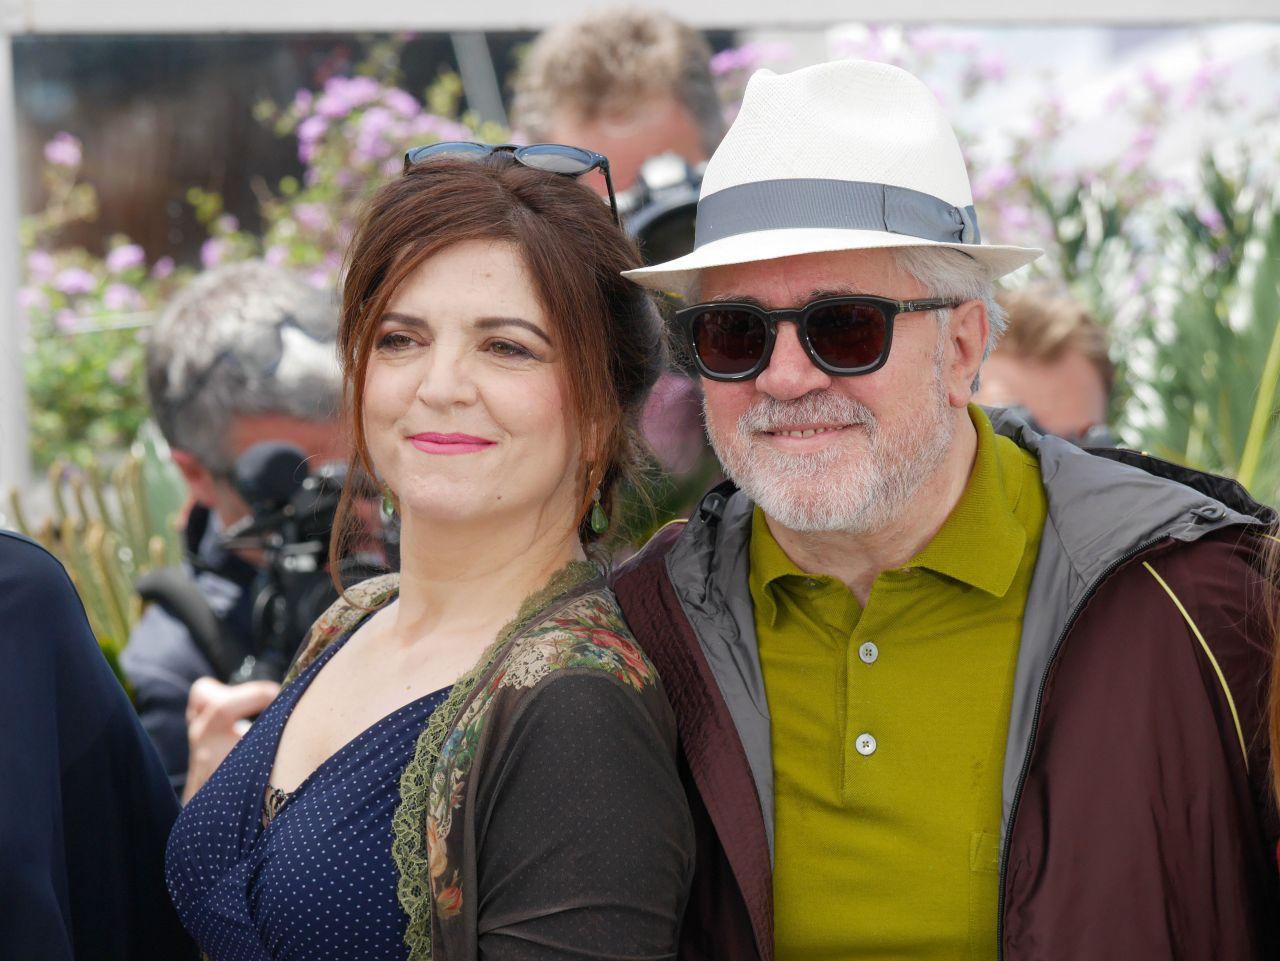 Agnes jaoui 70th cannes film festival jury photocall nudes (69 photo), Boobs Celebrites pic